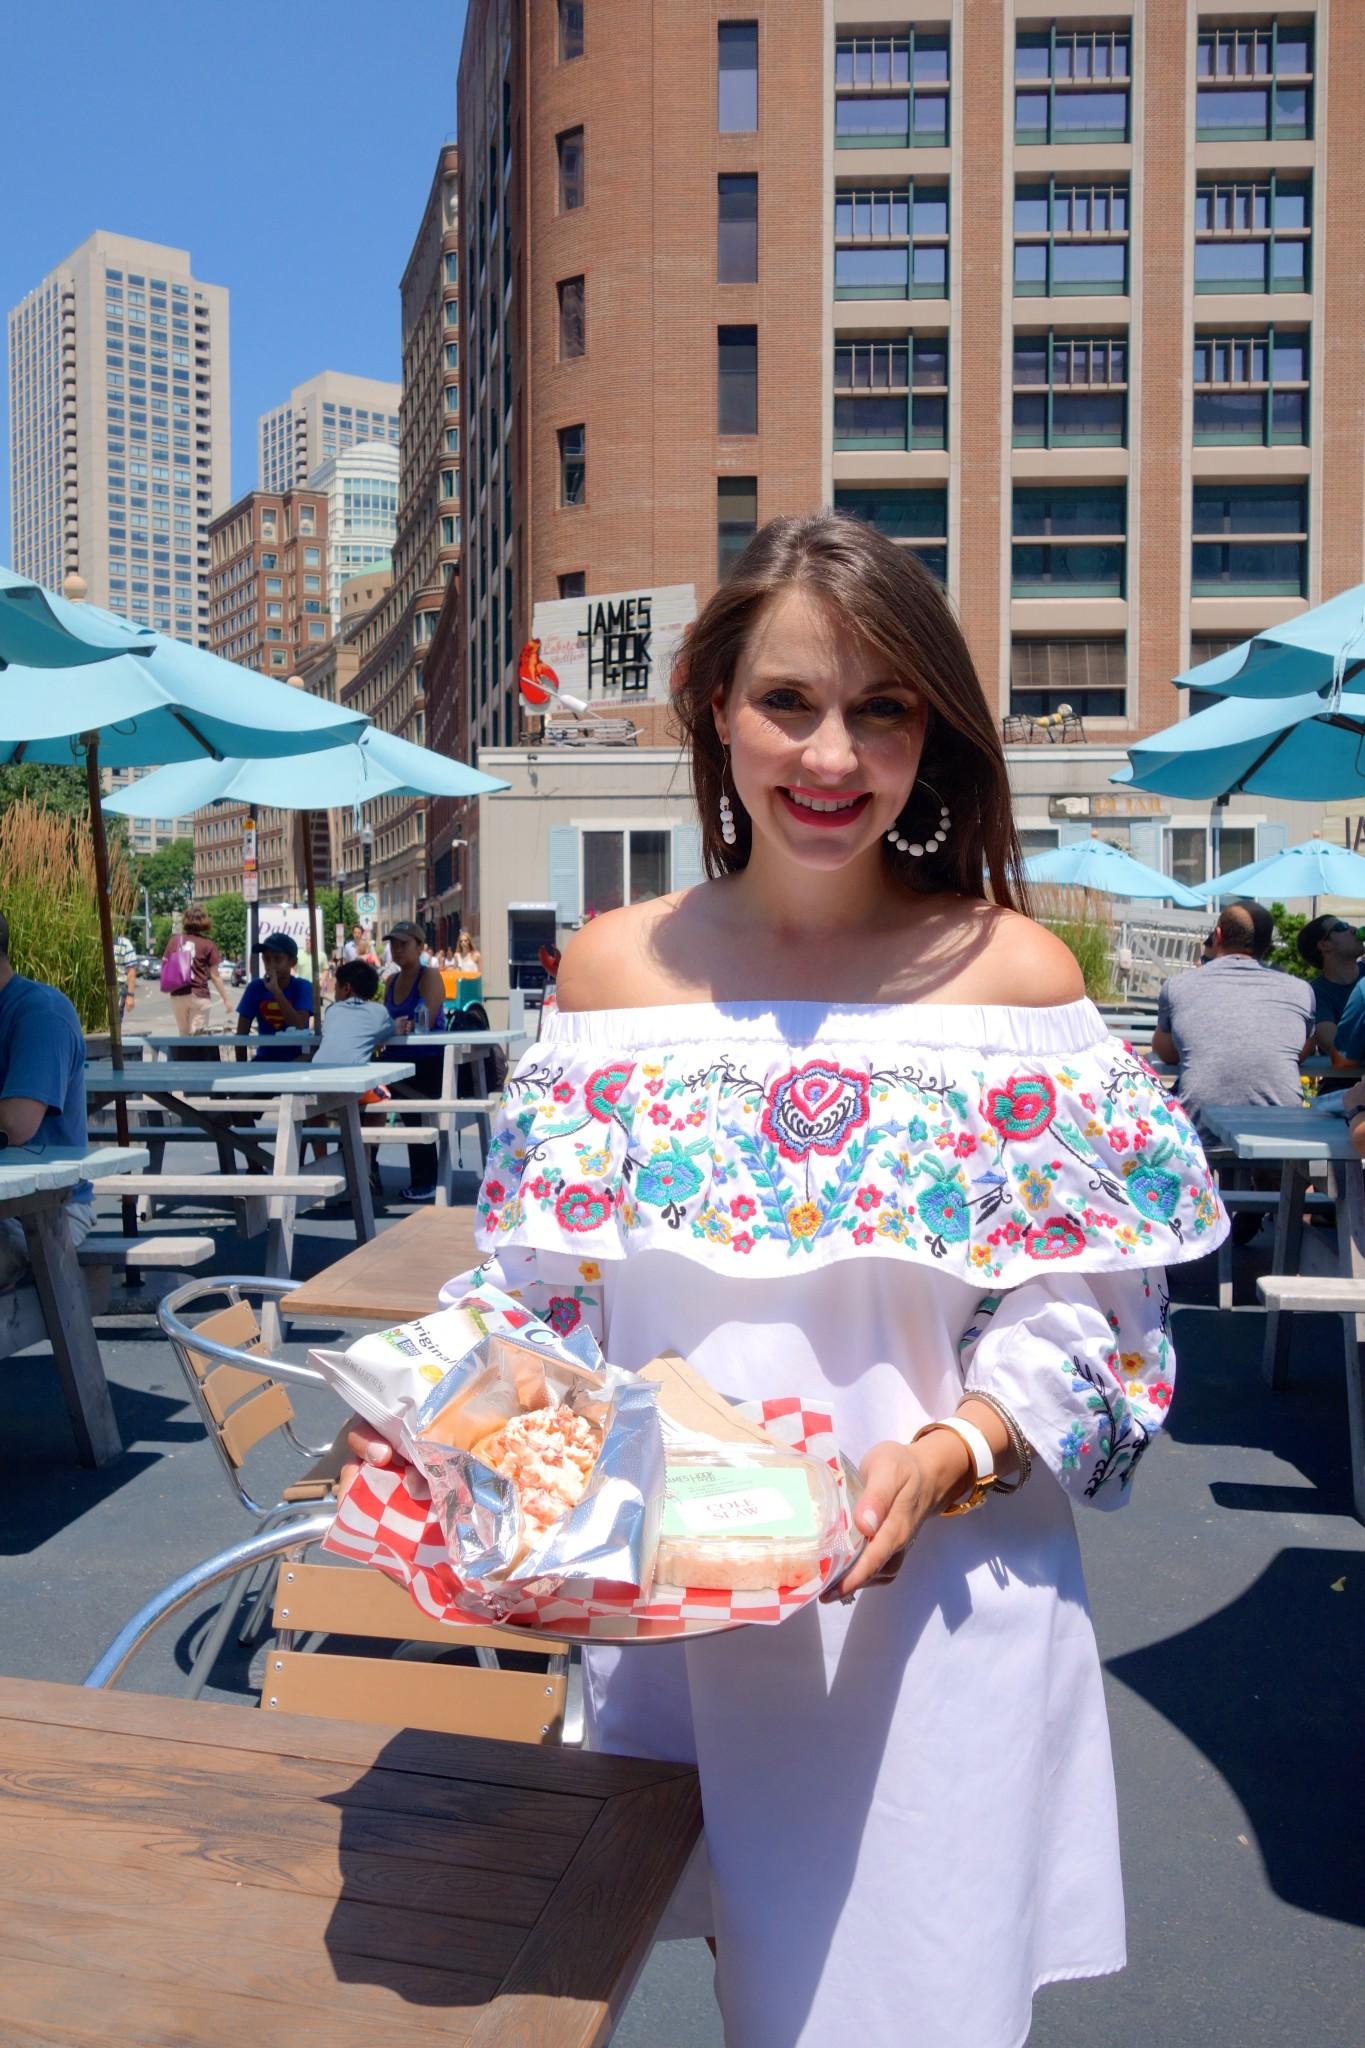 lobster roll, boston, james hook, the-alyst.com